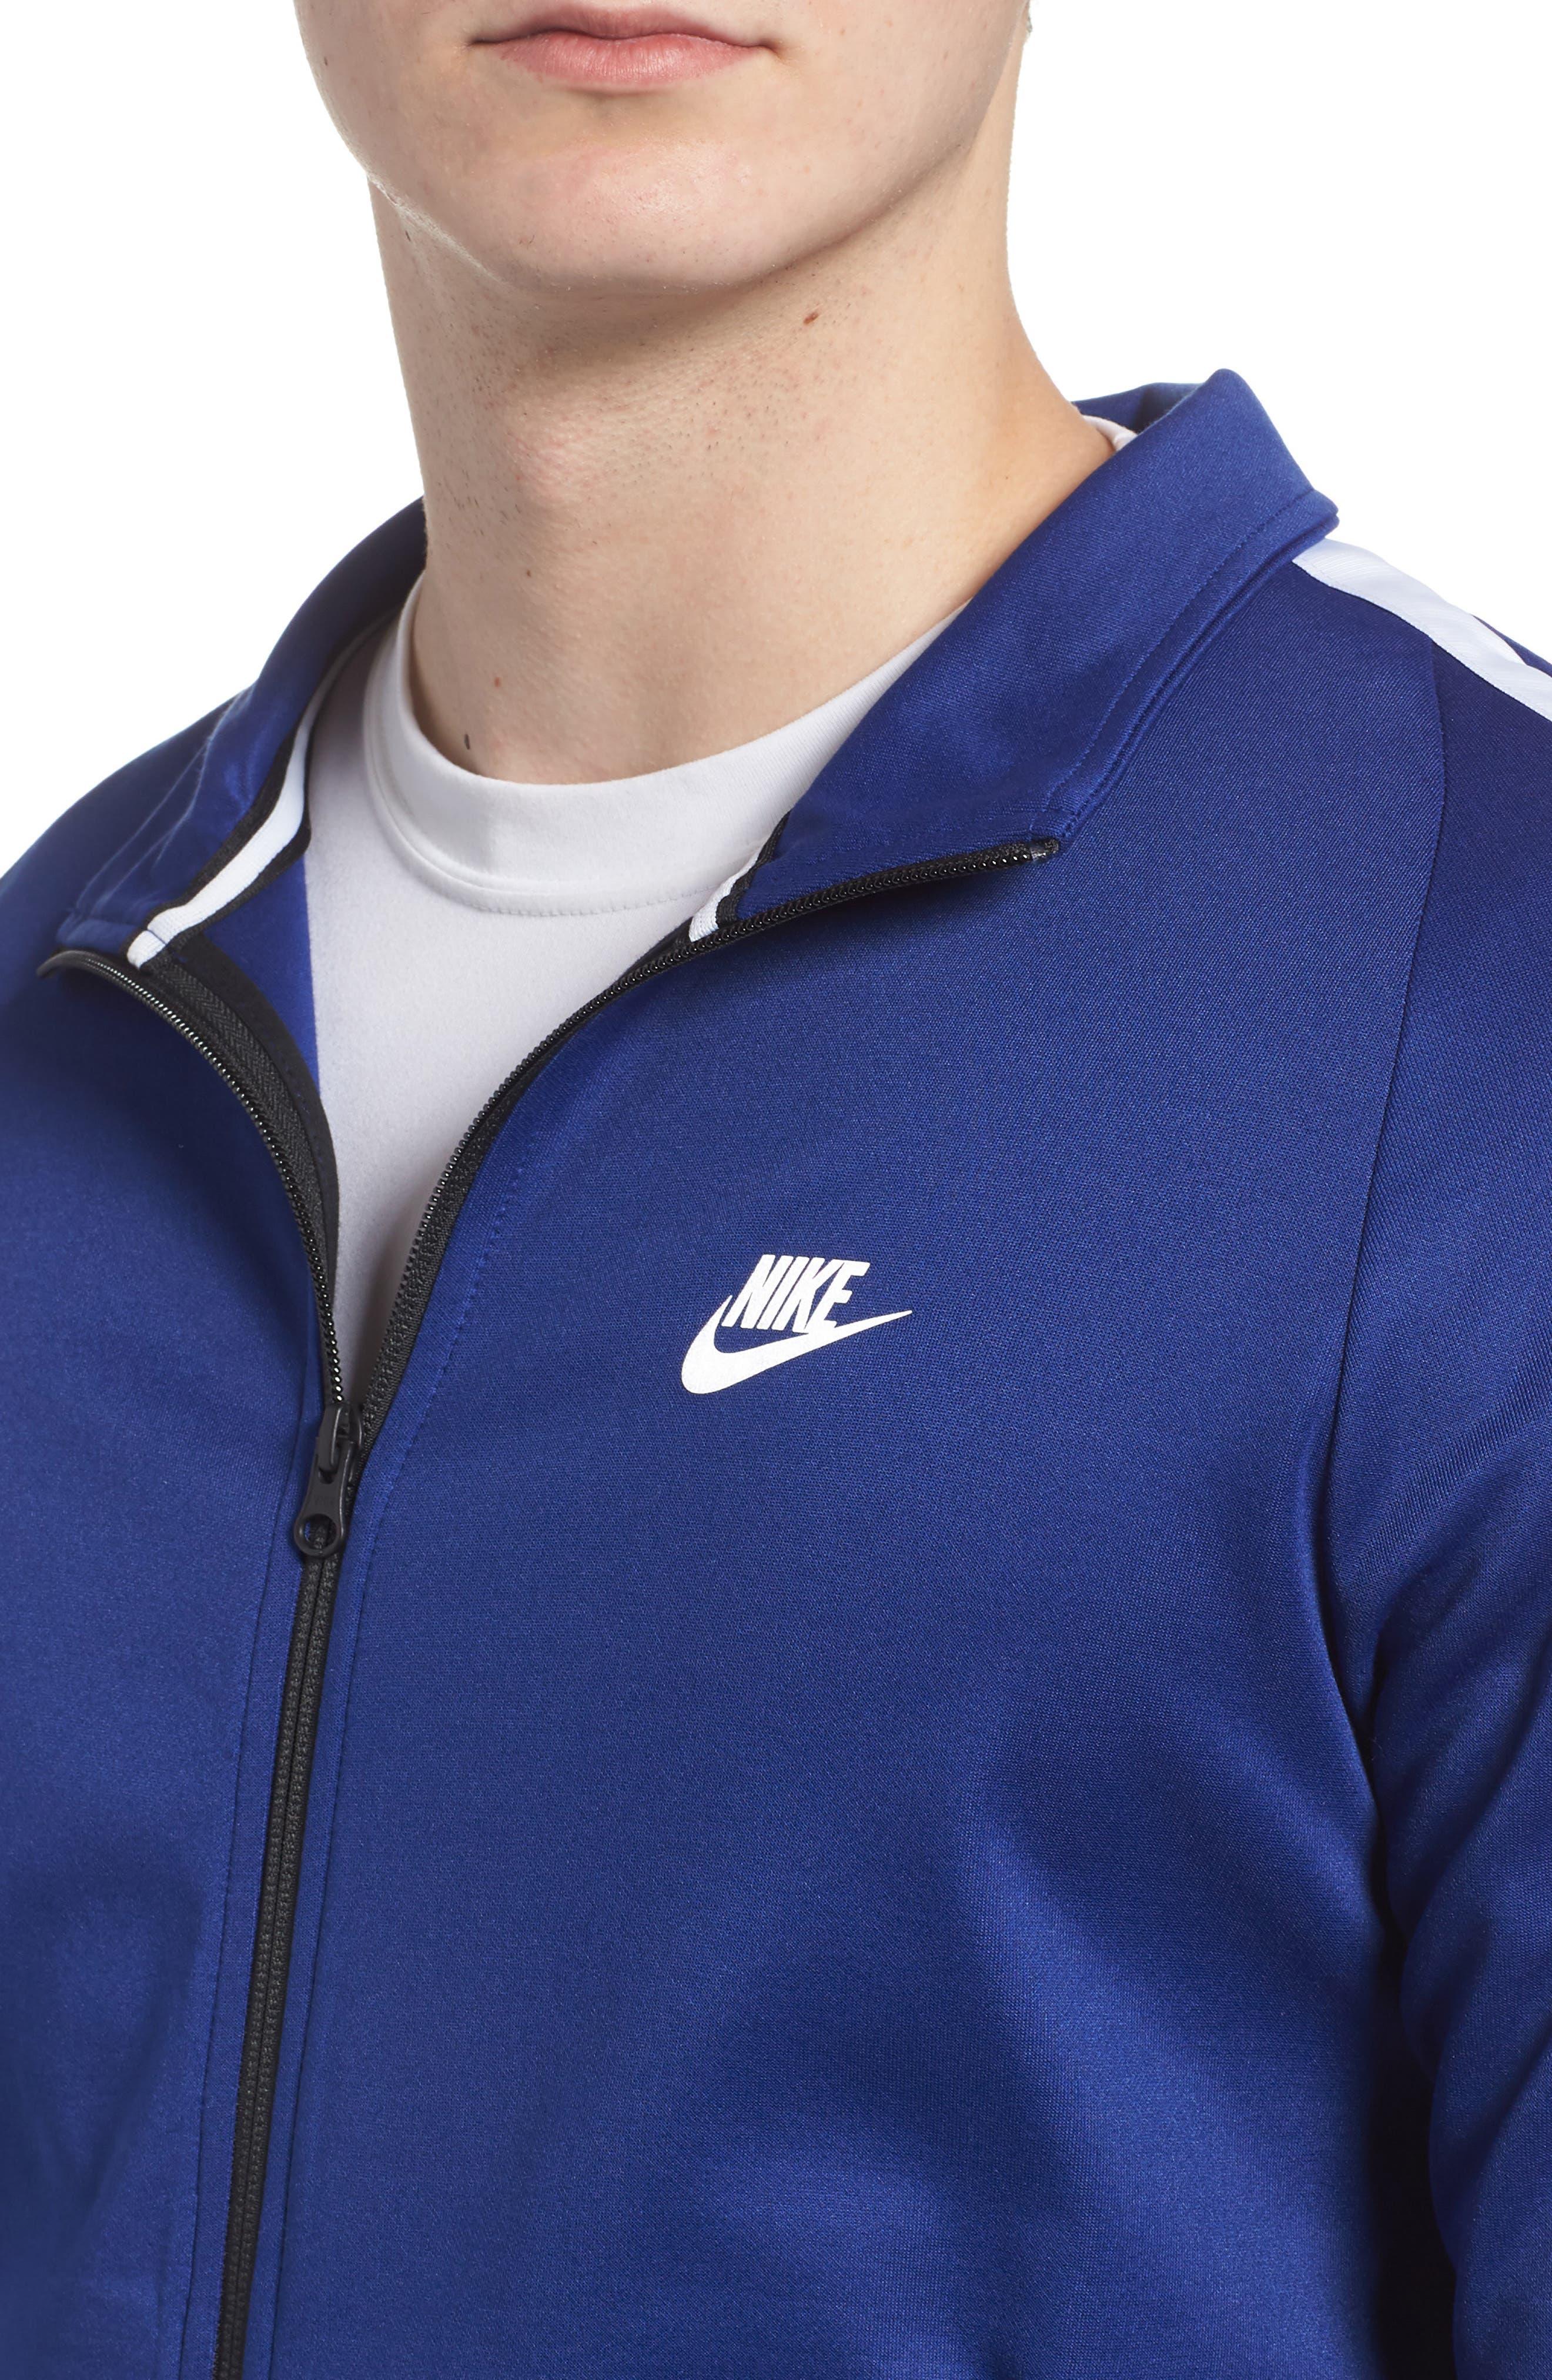 Sportswear Zip Track Jacket,                             Alternate thumbnail 4, color,                             DEEP ROYAL BLUE/ WHITE/ BLACK